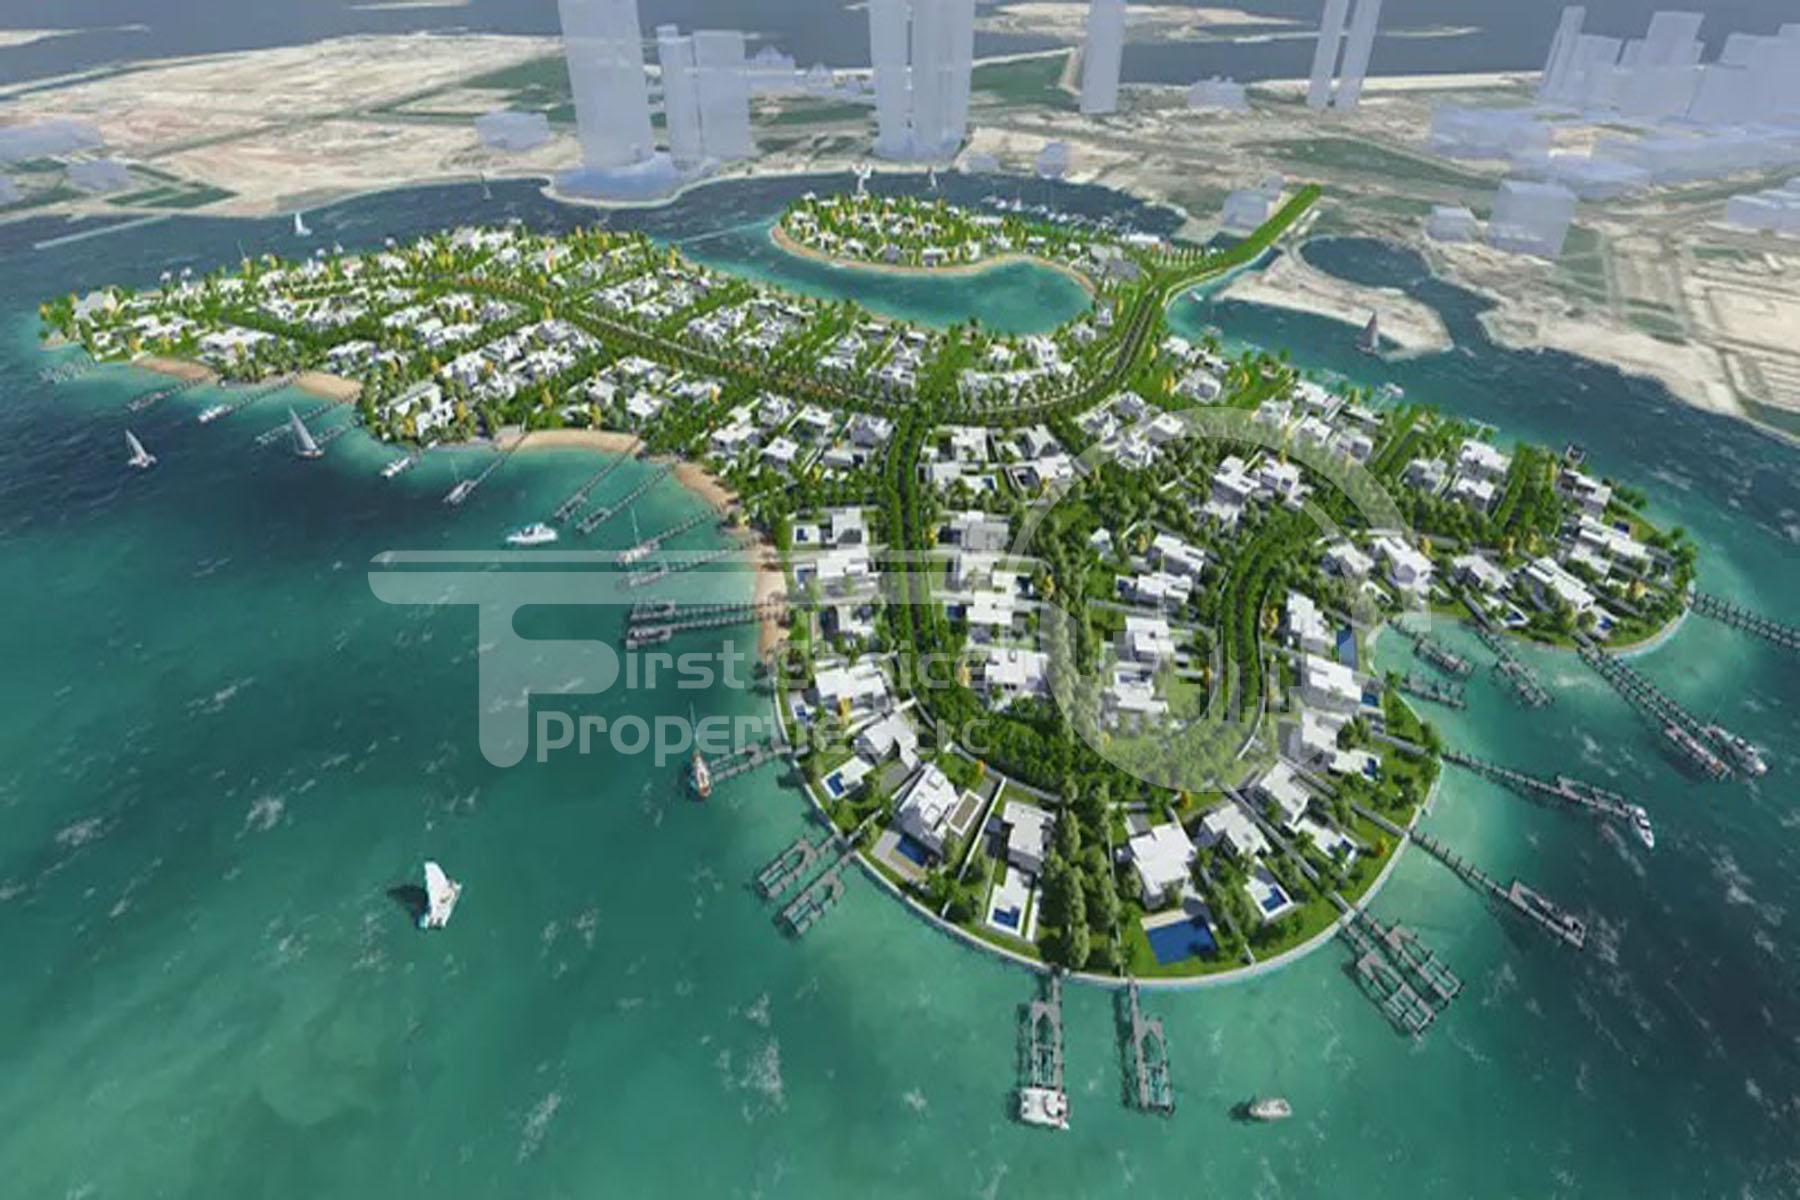 Residential Island - Nareel Island - Al Bateen - Abu Dhabi - UAE (16).jpg